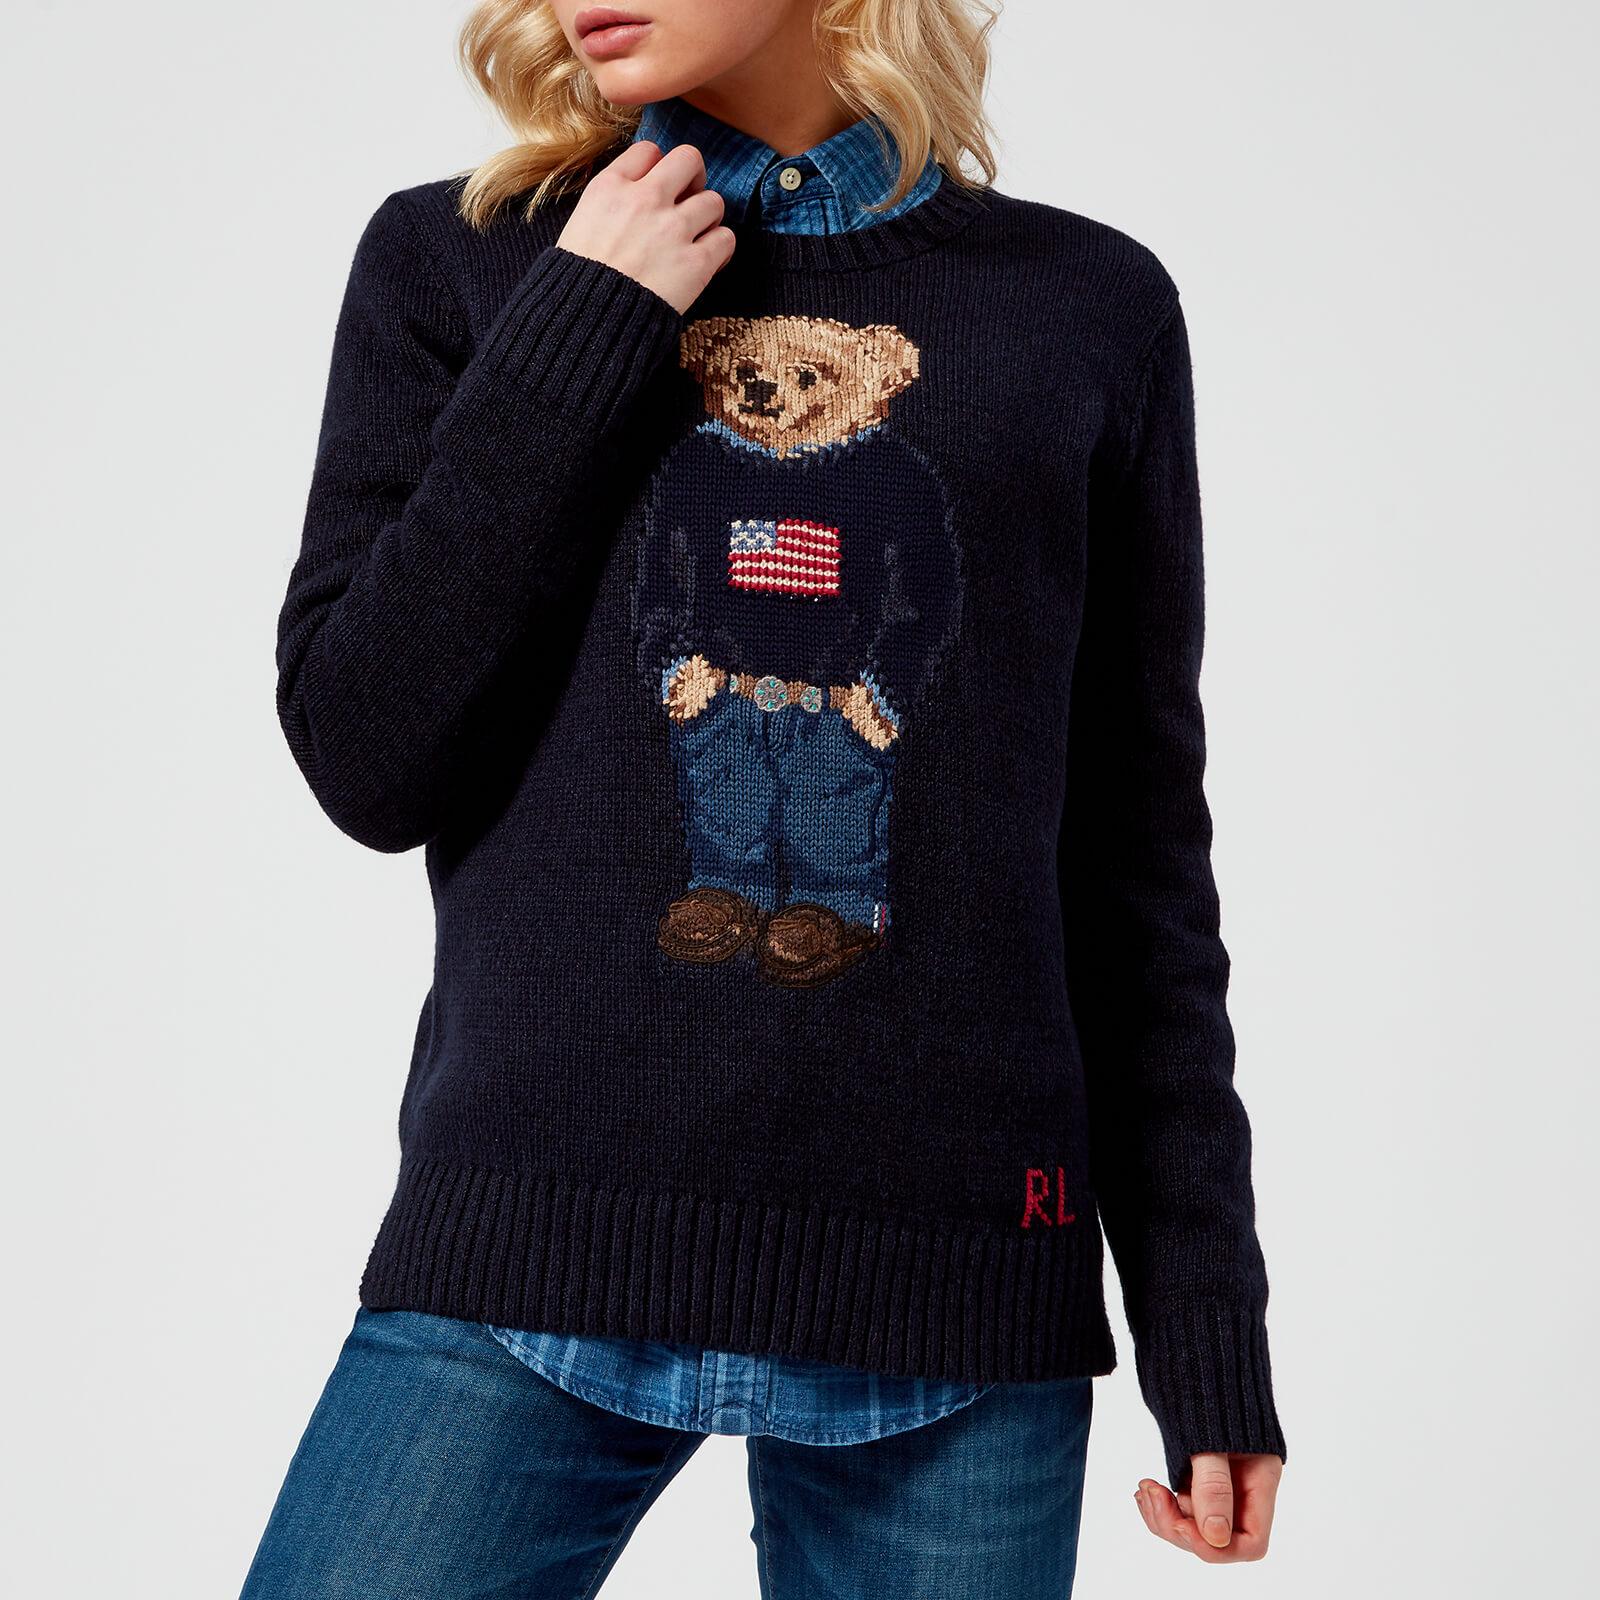 be887b9863d4 Polo Ralph Lauren Women's Bear Jumper - Navy - Free UK Delivery over £50